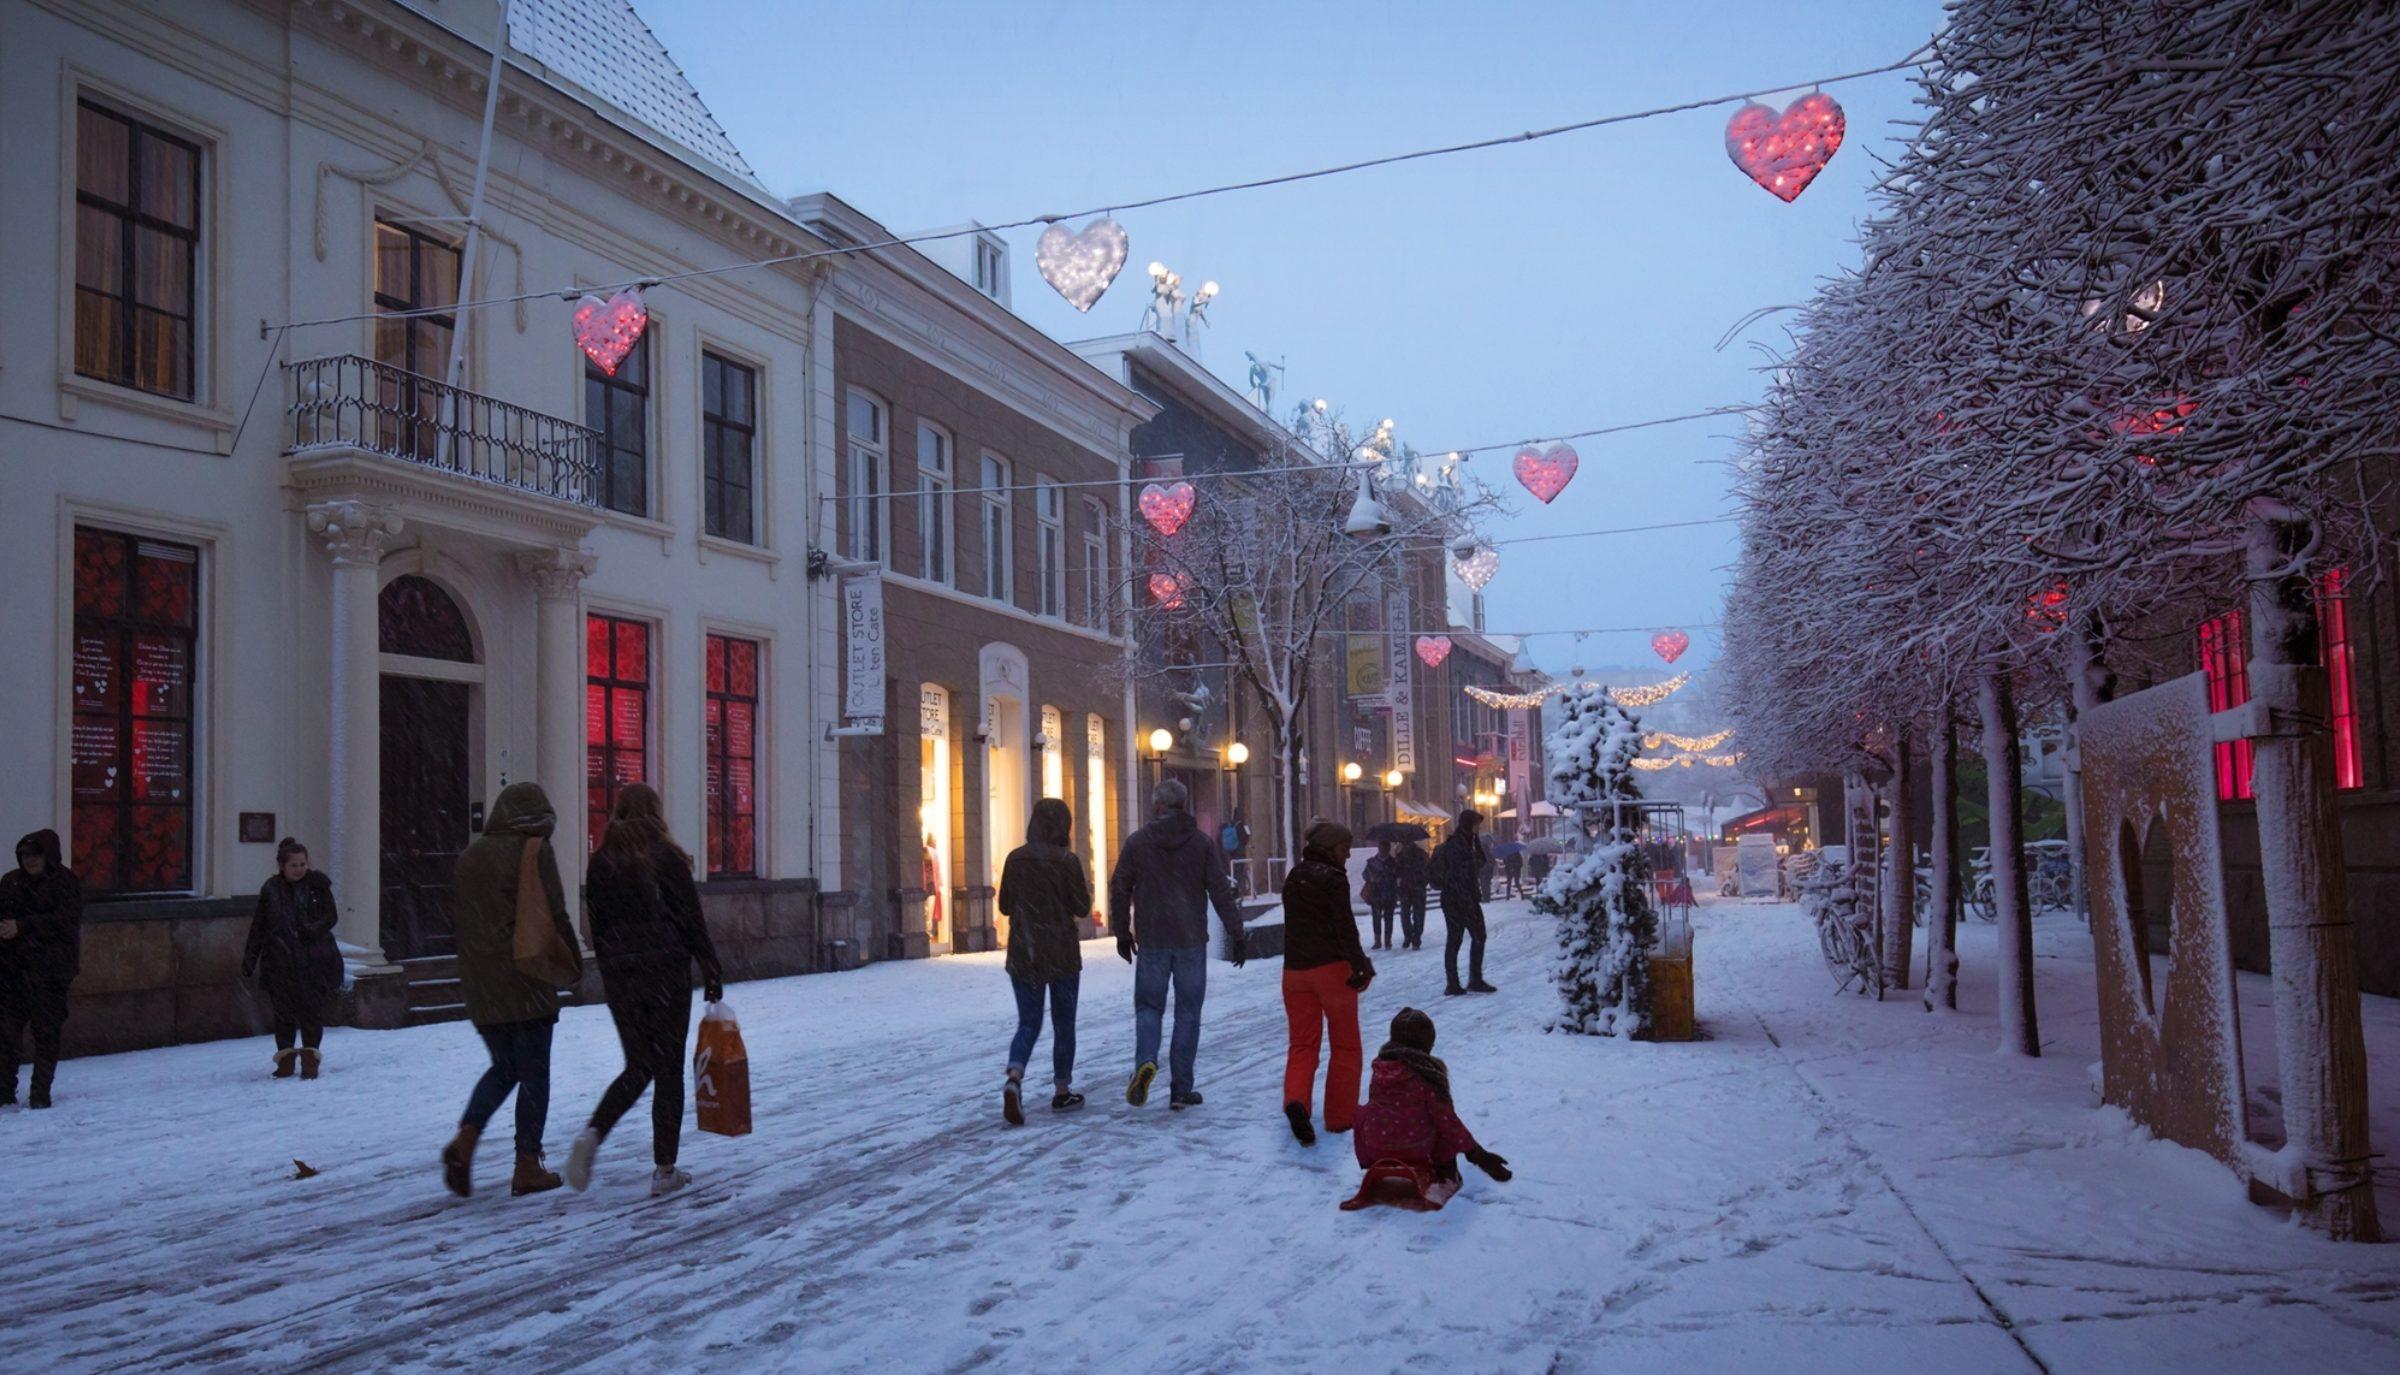 2017 Long Lane Of Love Ebo Fraterman Langestraat Winter Wonderland